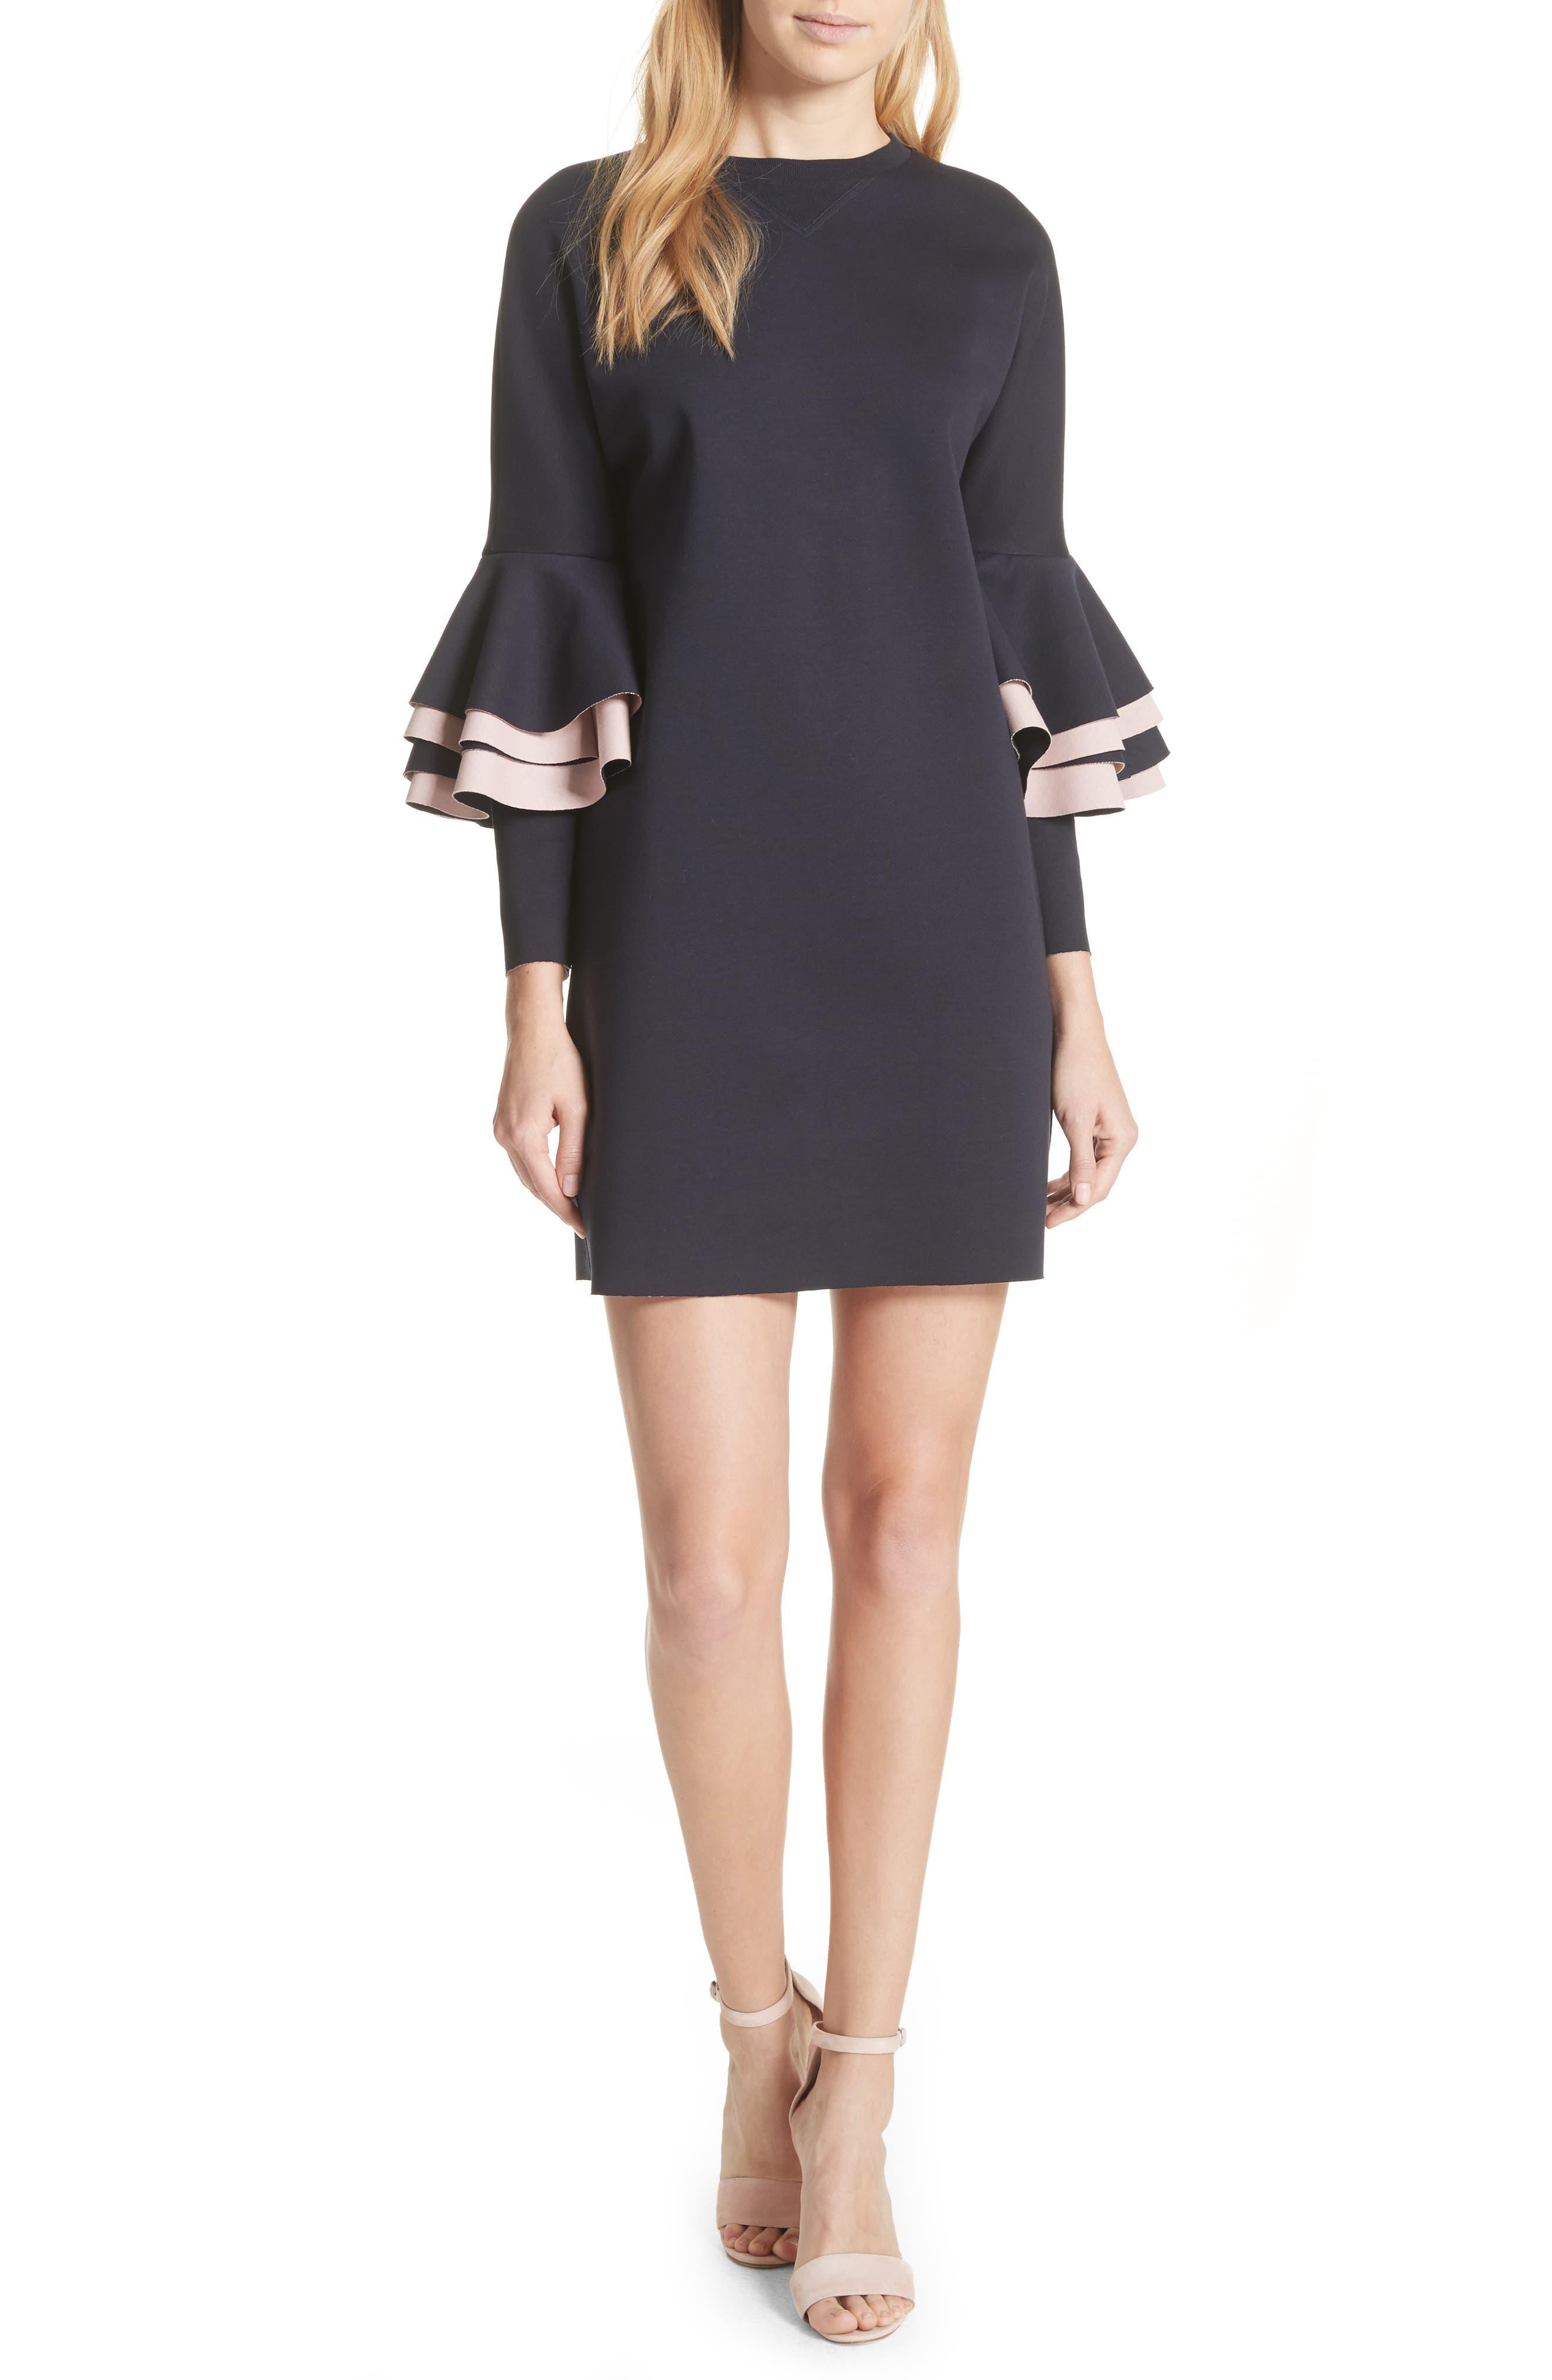 Chloae Frill Sleeve Sweatshirt Dress,                         Main,                         color, Navy